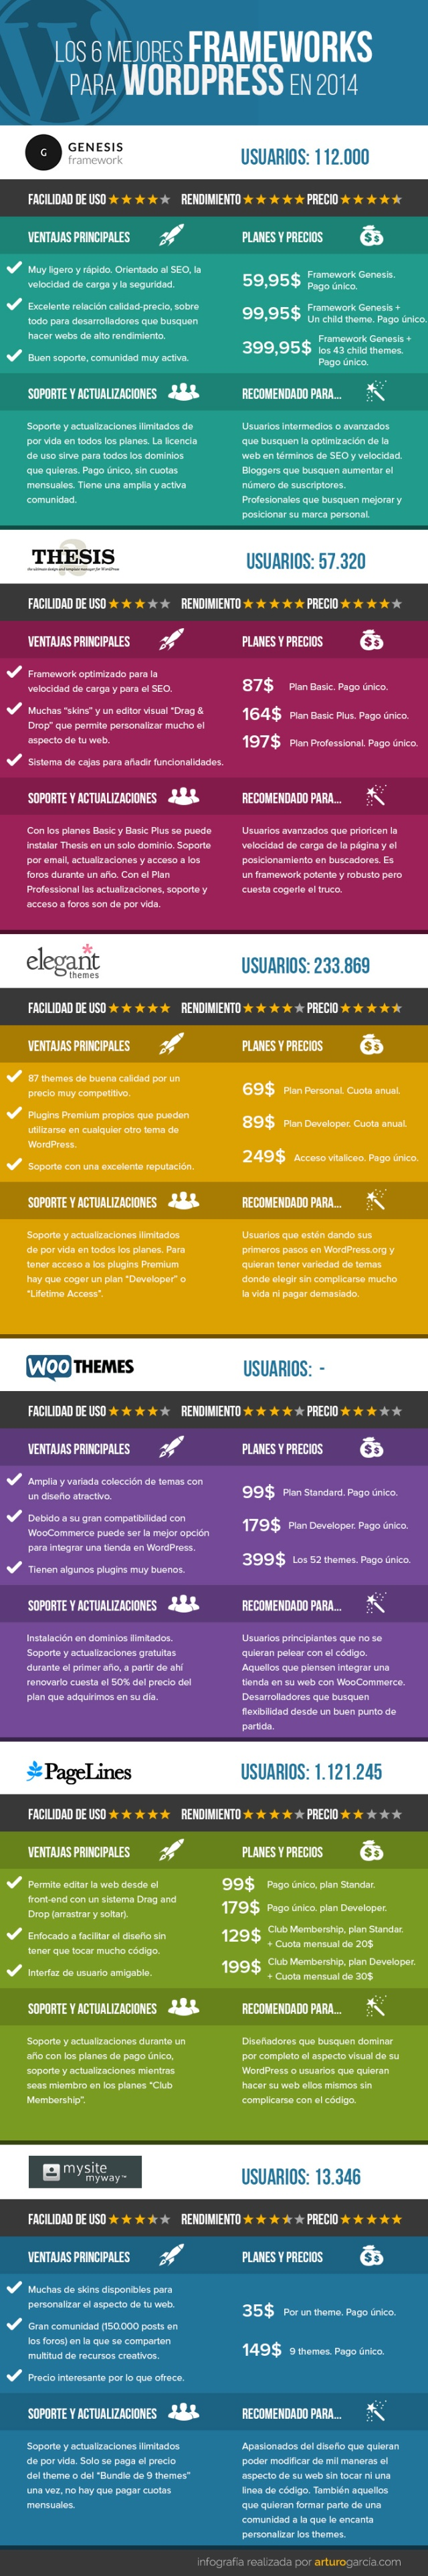 Los 6 mejores frameworks para WordPress